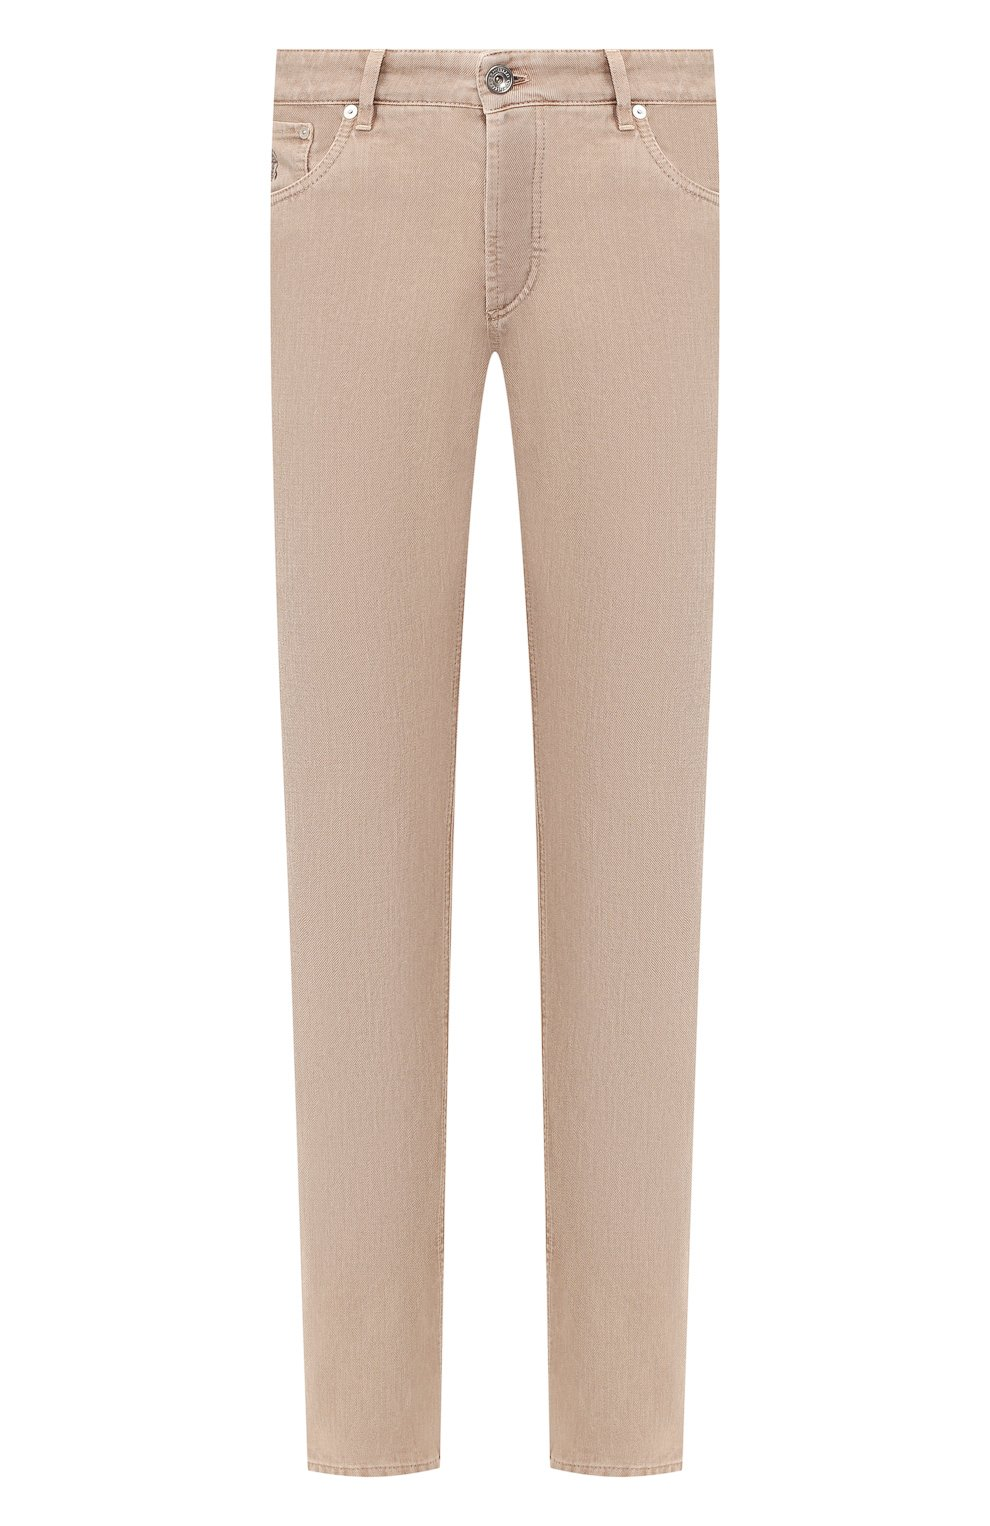 Мужские джинсы BRUNELLO CUCINELLI светло-бежевого цвета, арт. M051KB2210 | Фото 1